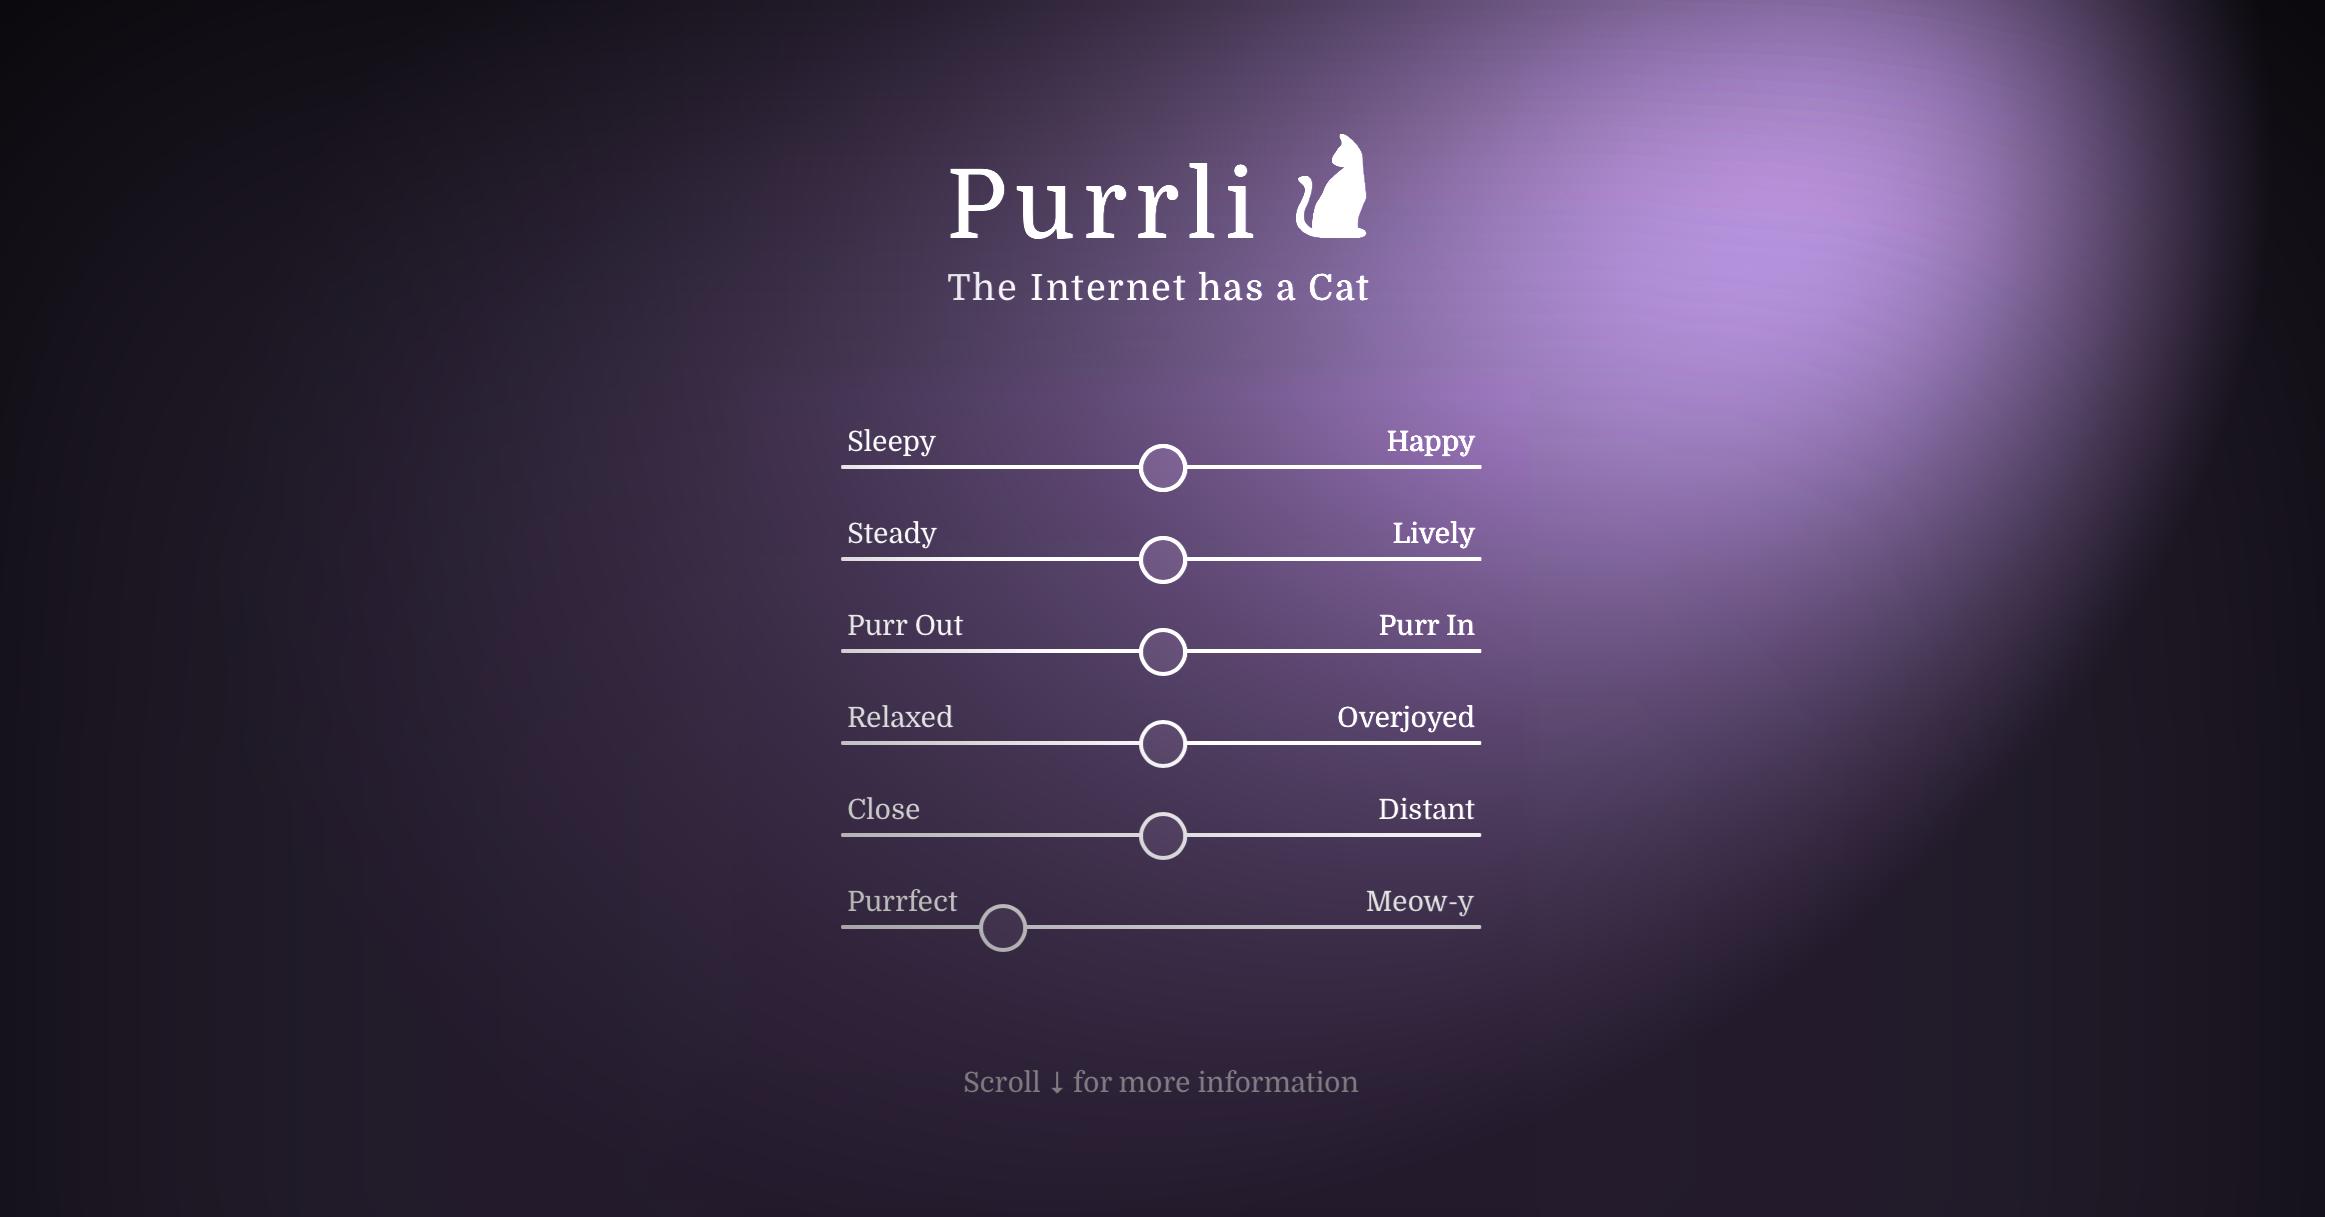 The Internet has a Cat! Meet Purrli, the Online Cat Purr Generator